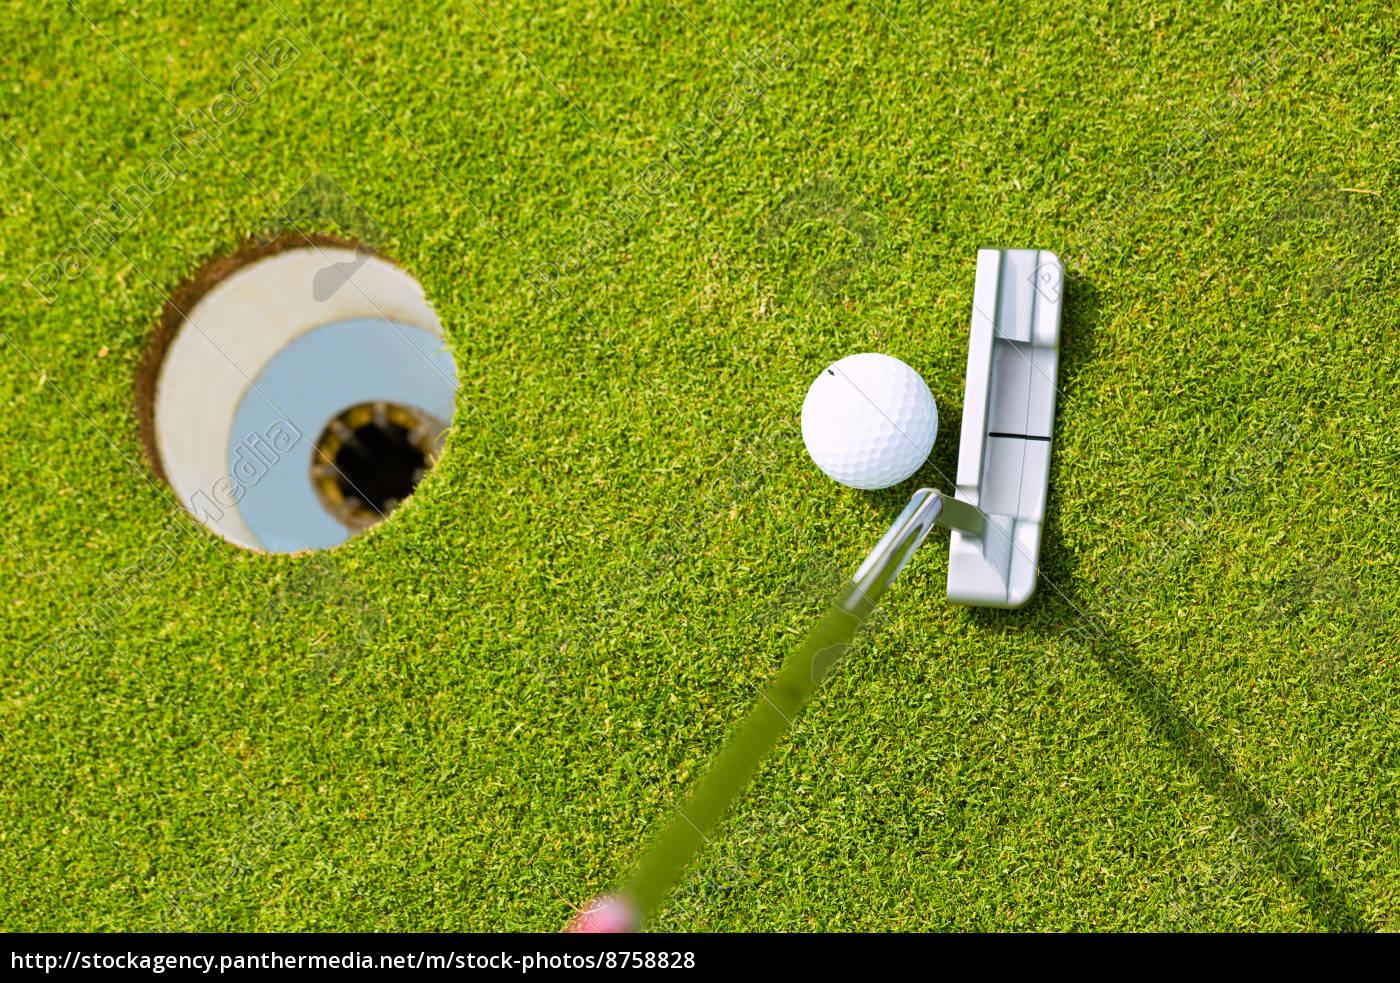 _golfers-playing-golf-at-putting_08758828_high.0.jpg